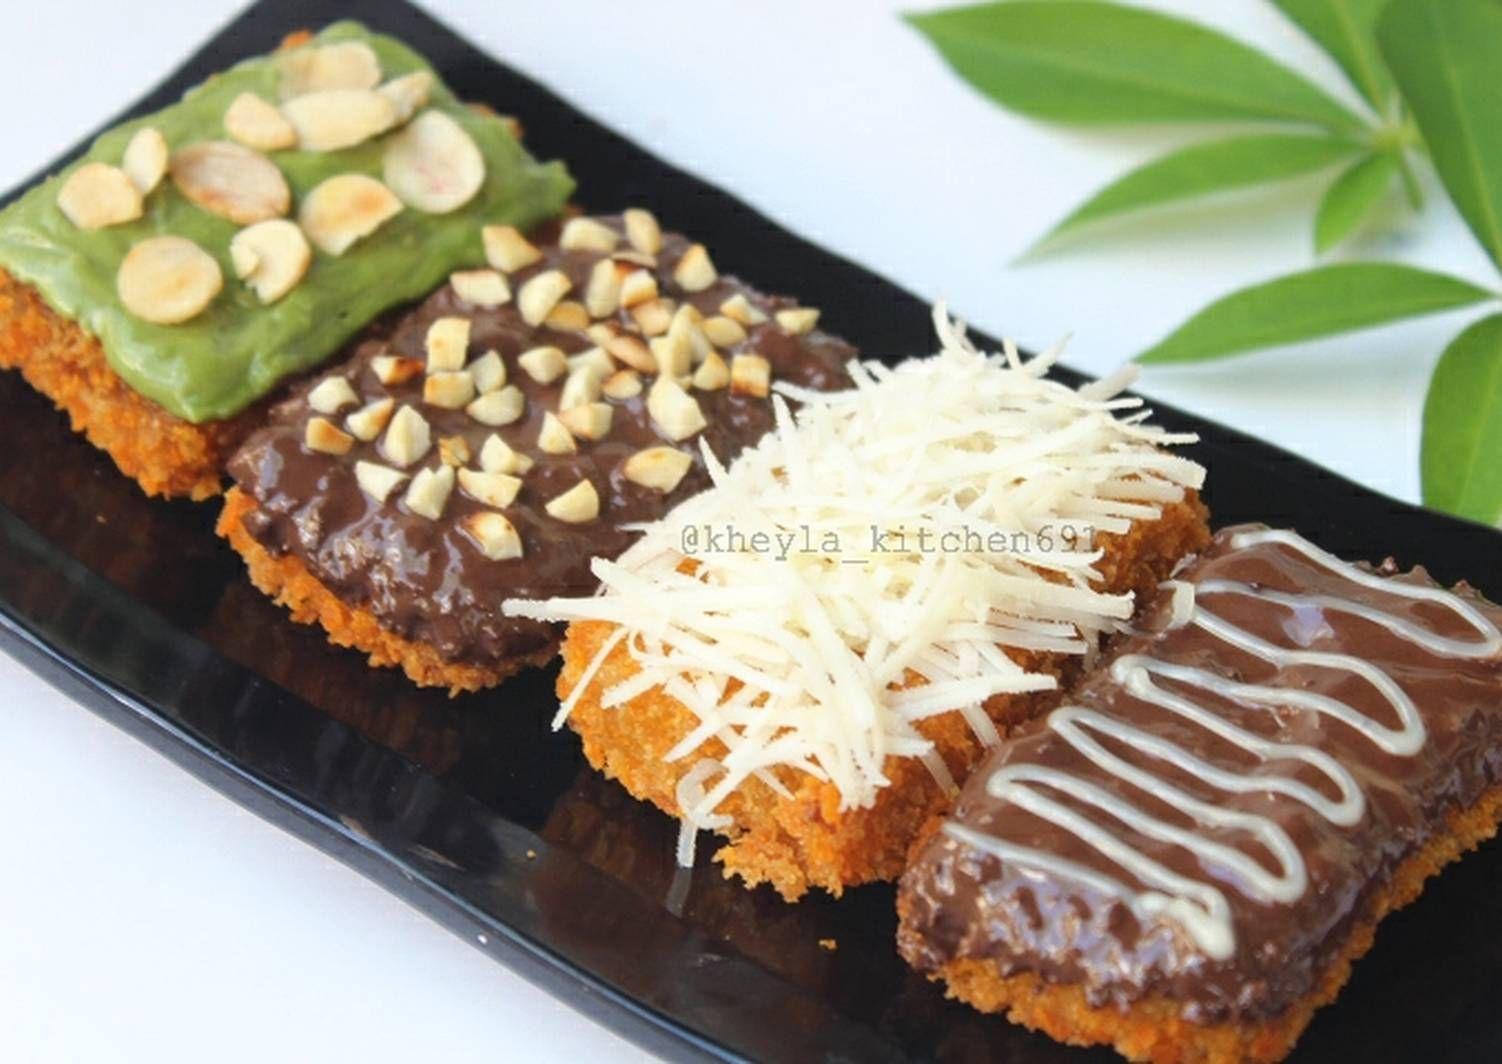 Resep Nugget Pisang Hitz Oleh Kheyla S Kitchen Resep Makanan Makanan Manis Makanan Jalanan